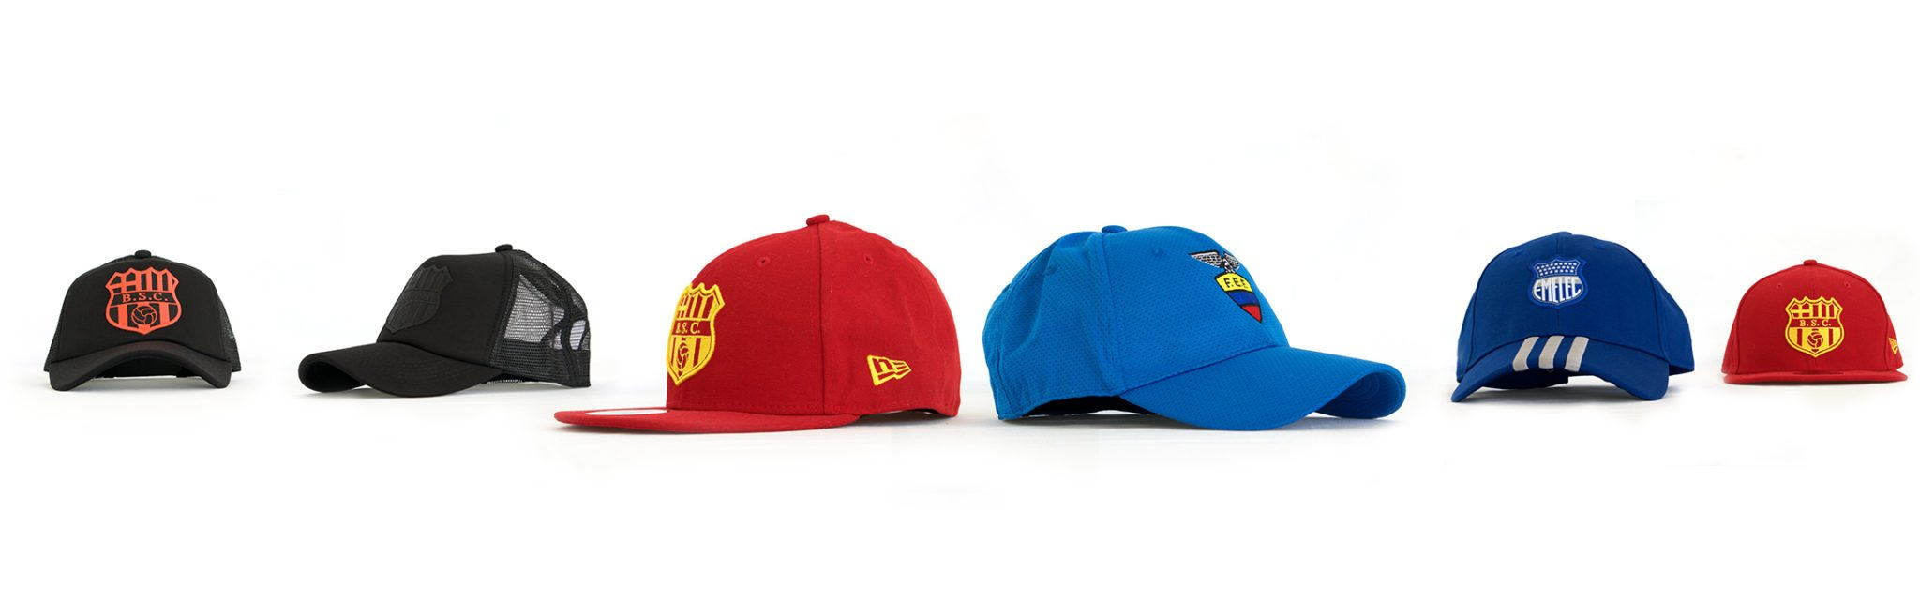 593 Sports   Caps